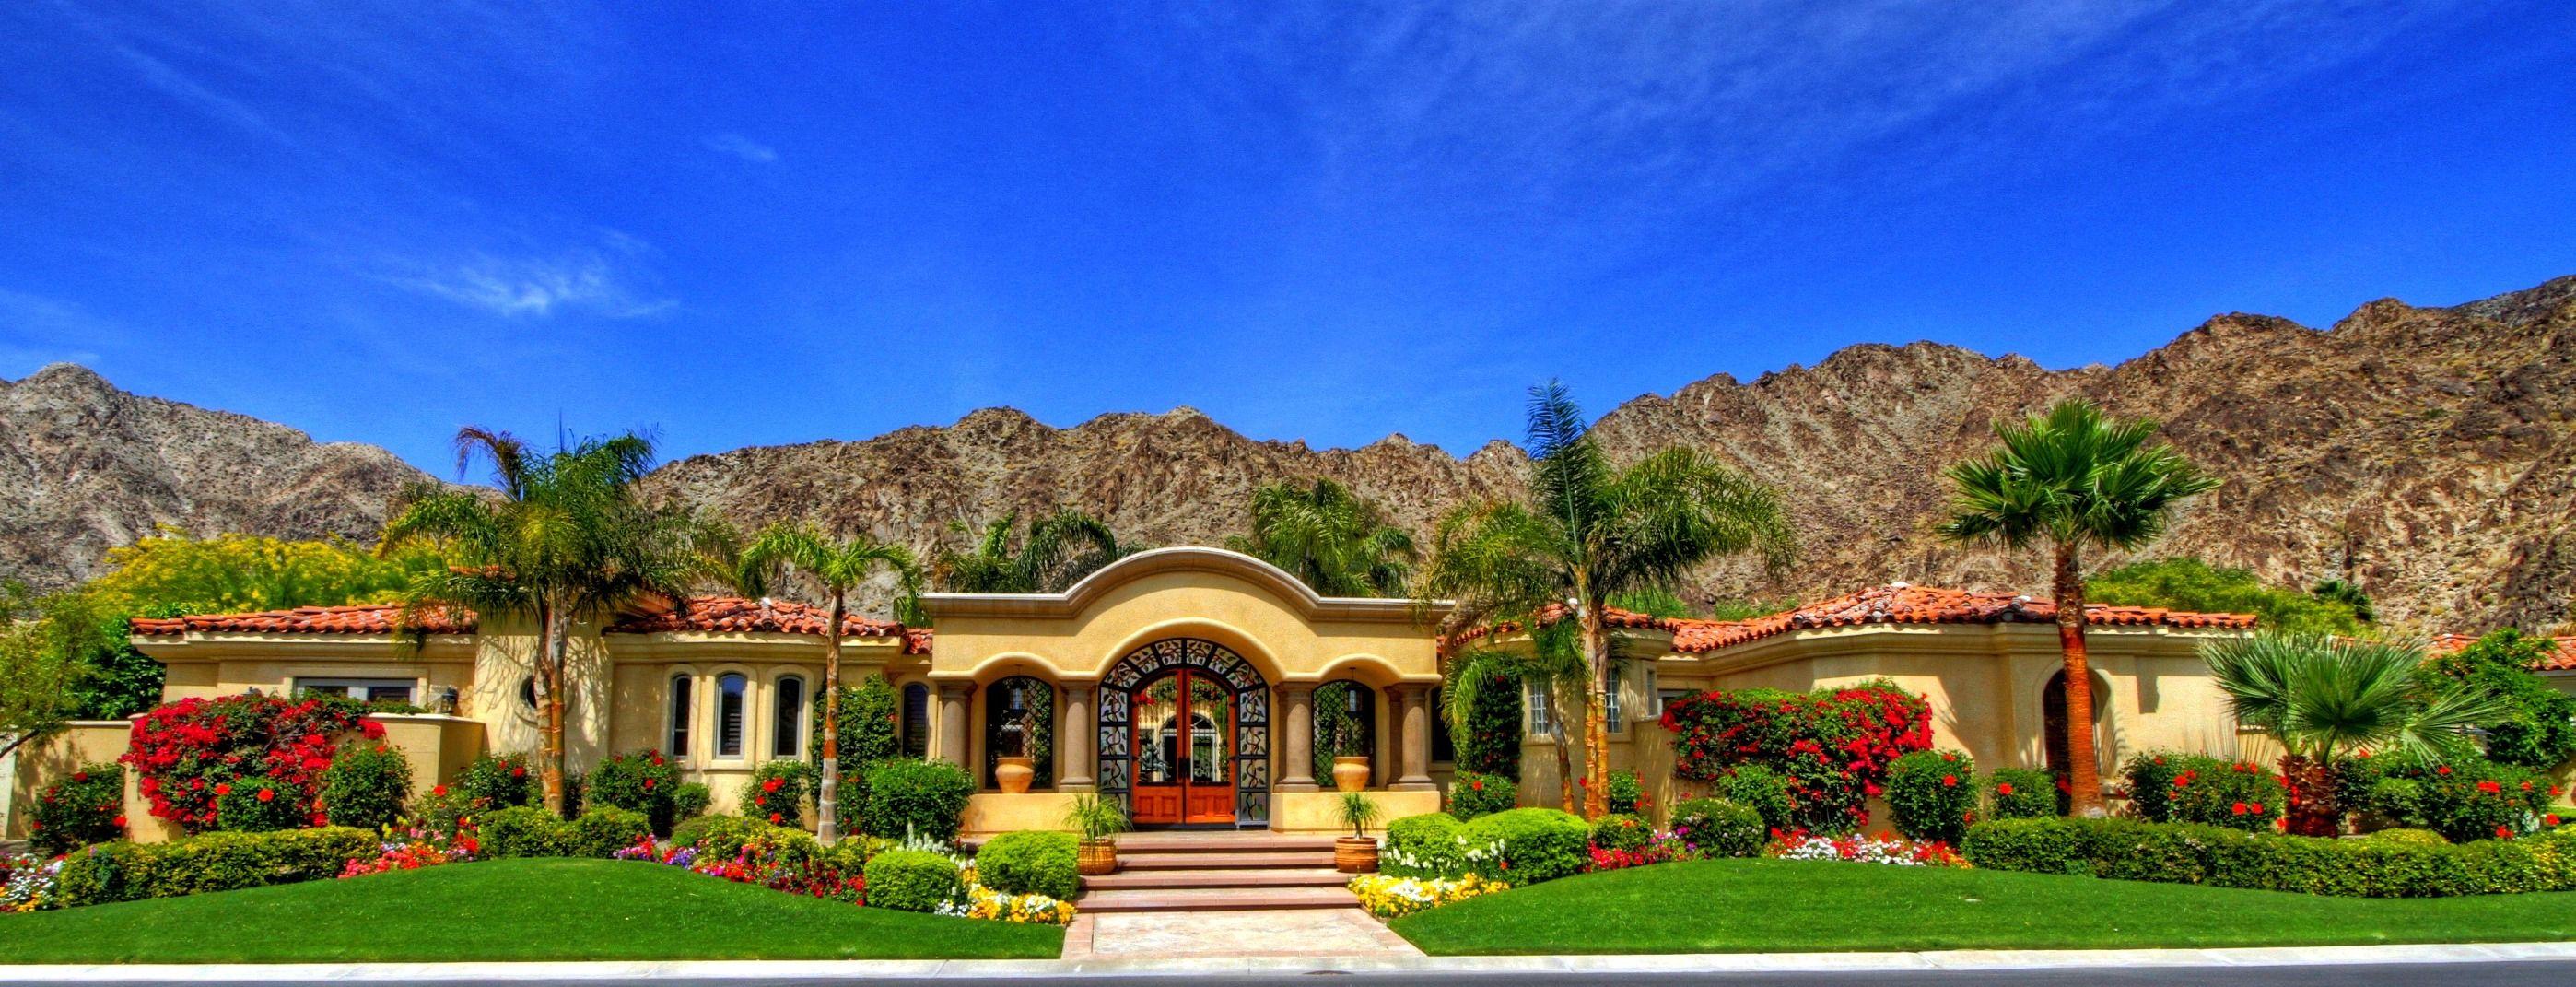 Luxury homes in california photo of luxury home in la for Luxury houses in california